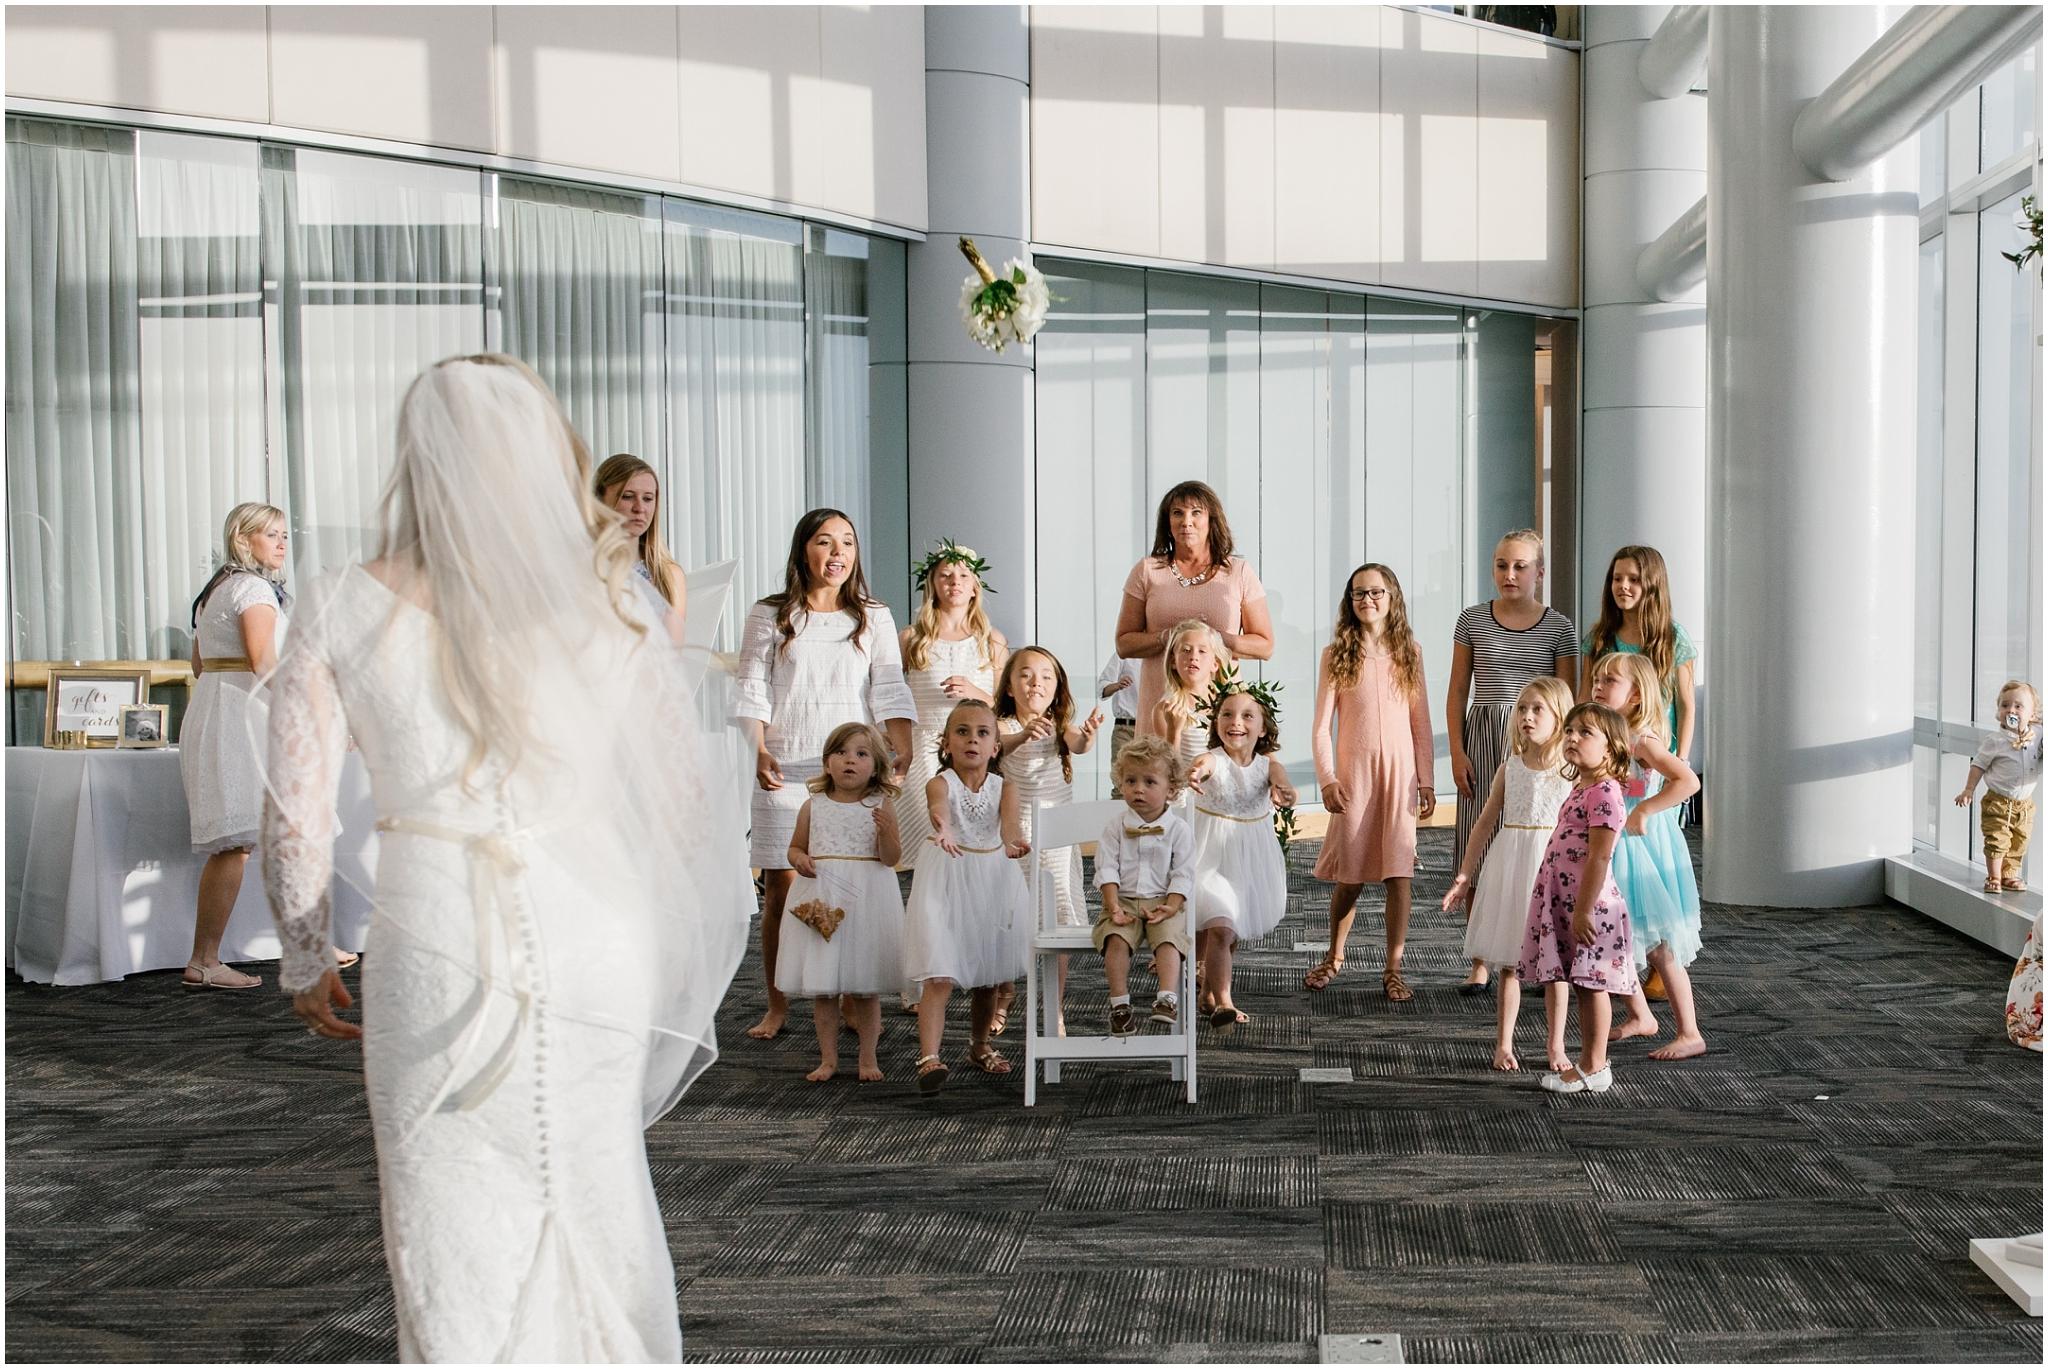 CherylandTyler-542_Lizzie-B-Imagery-Utah-Wedding-Photographer-Salt-Lake-City-Temple-Wells-Fargo-Building-Reception.jpg